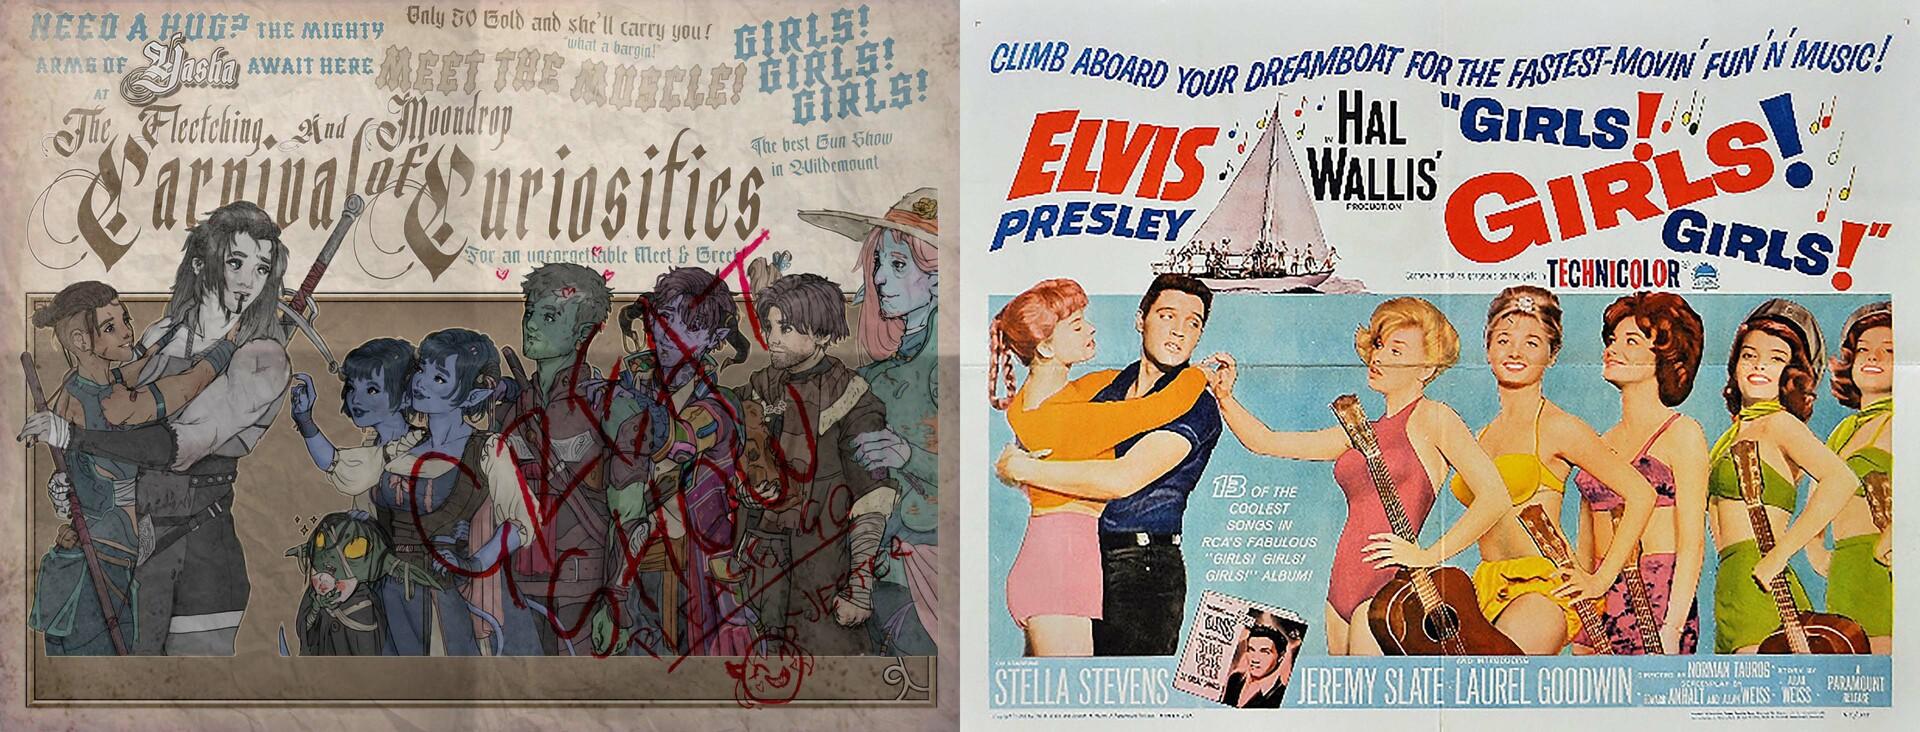 Original Reference - 1962 'Girls! Girls! Girls!' Film Poster